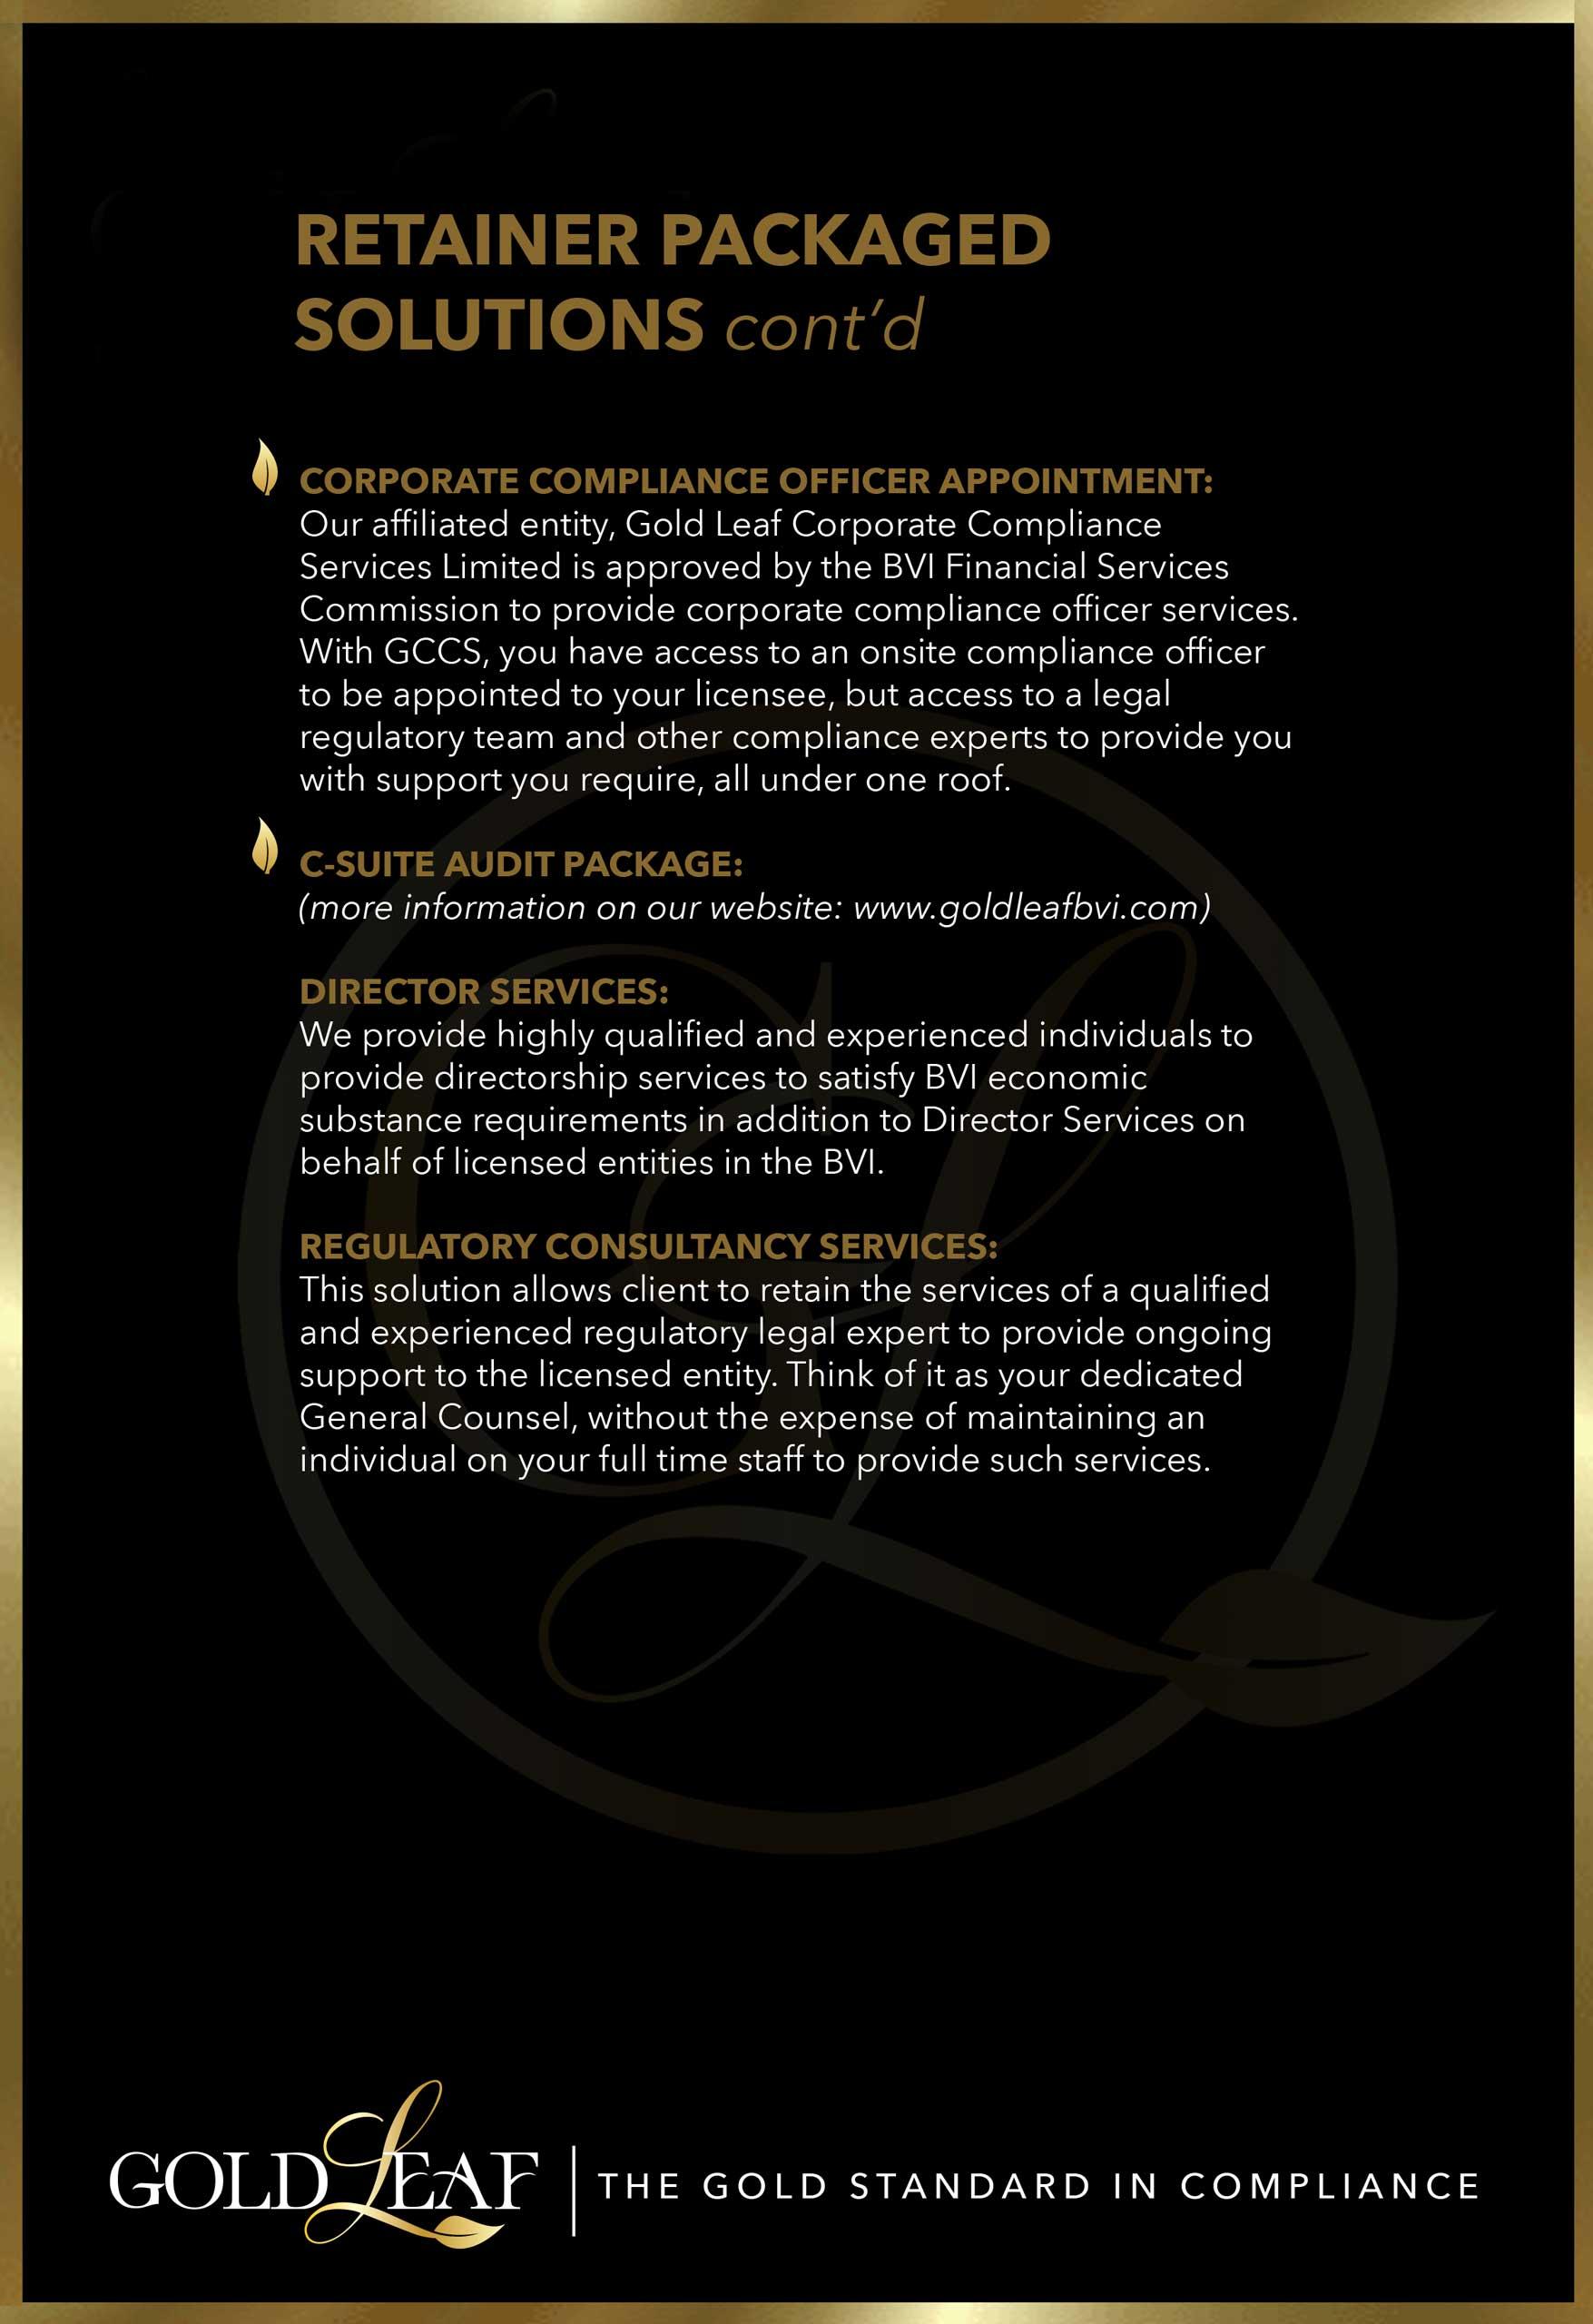 Gold-Leaf-SOLUTIONS-Menu-5